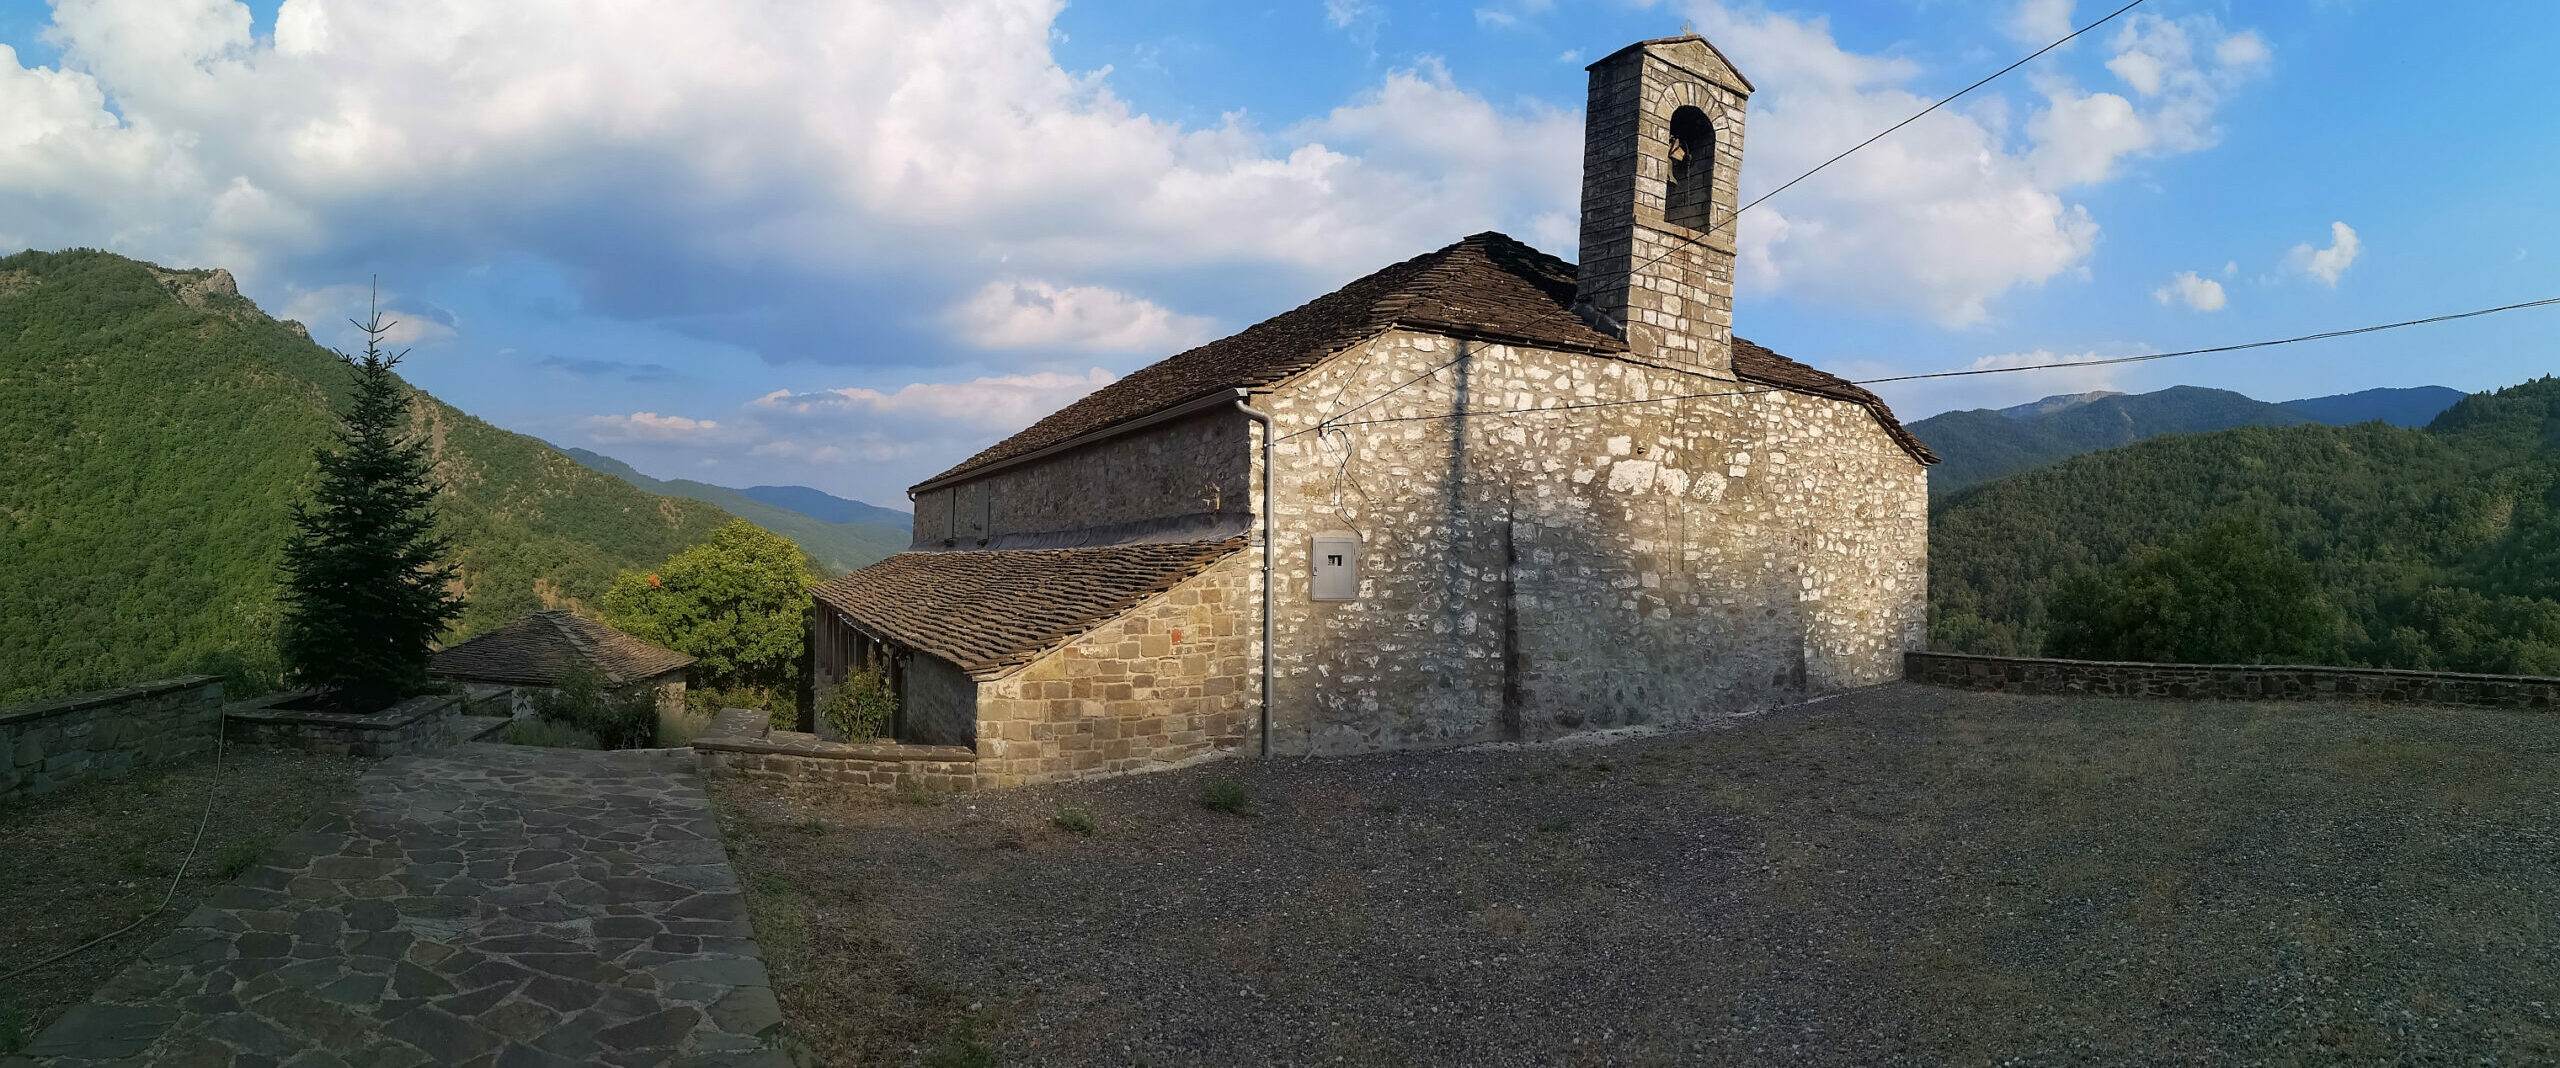 Epirus: Konitsa Ioannina – Chioniades the small Greek village where more than 70 painters were born